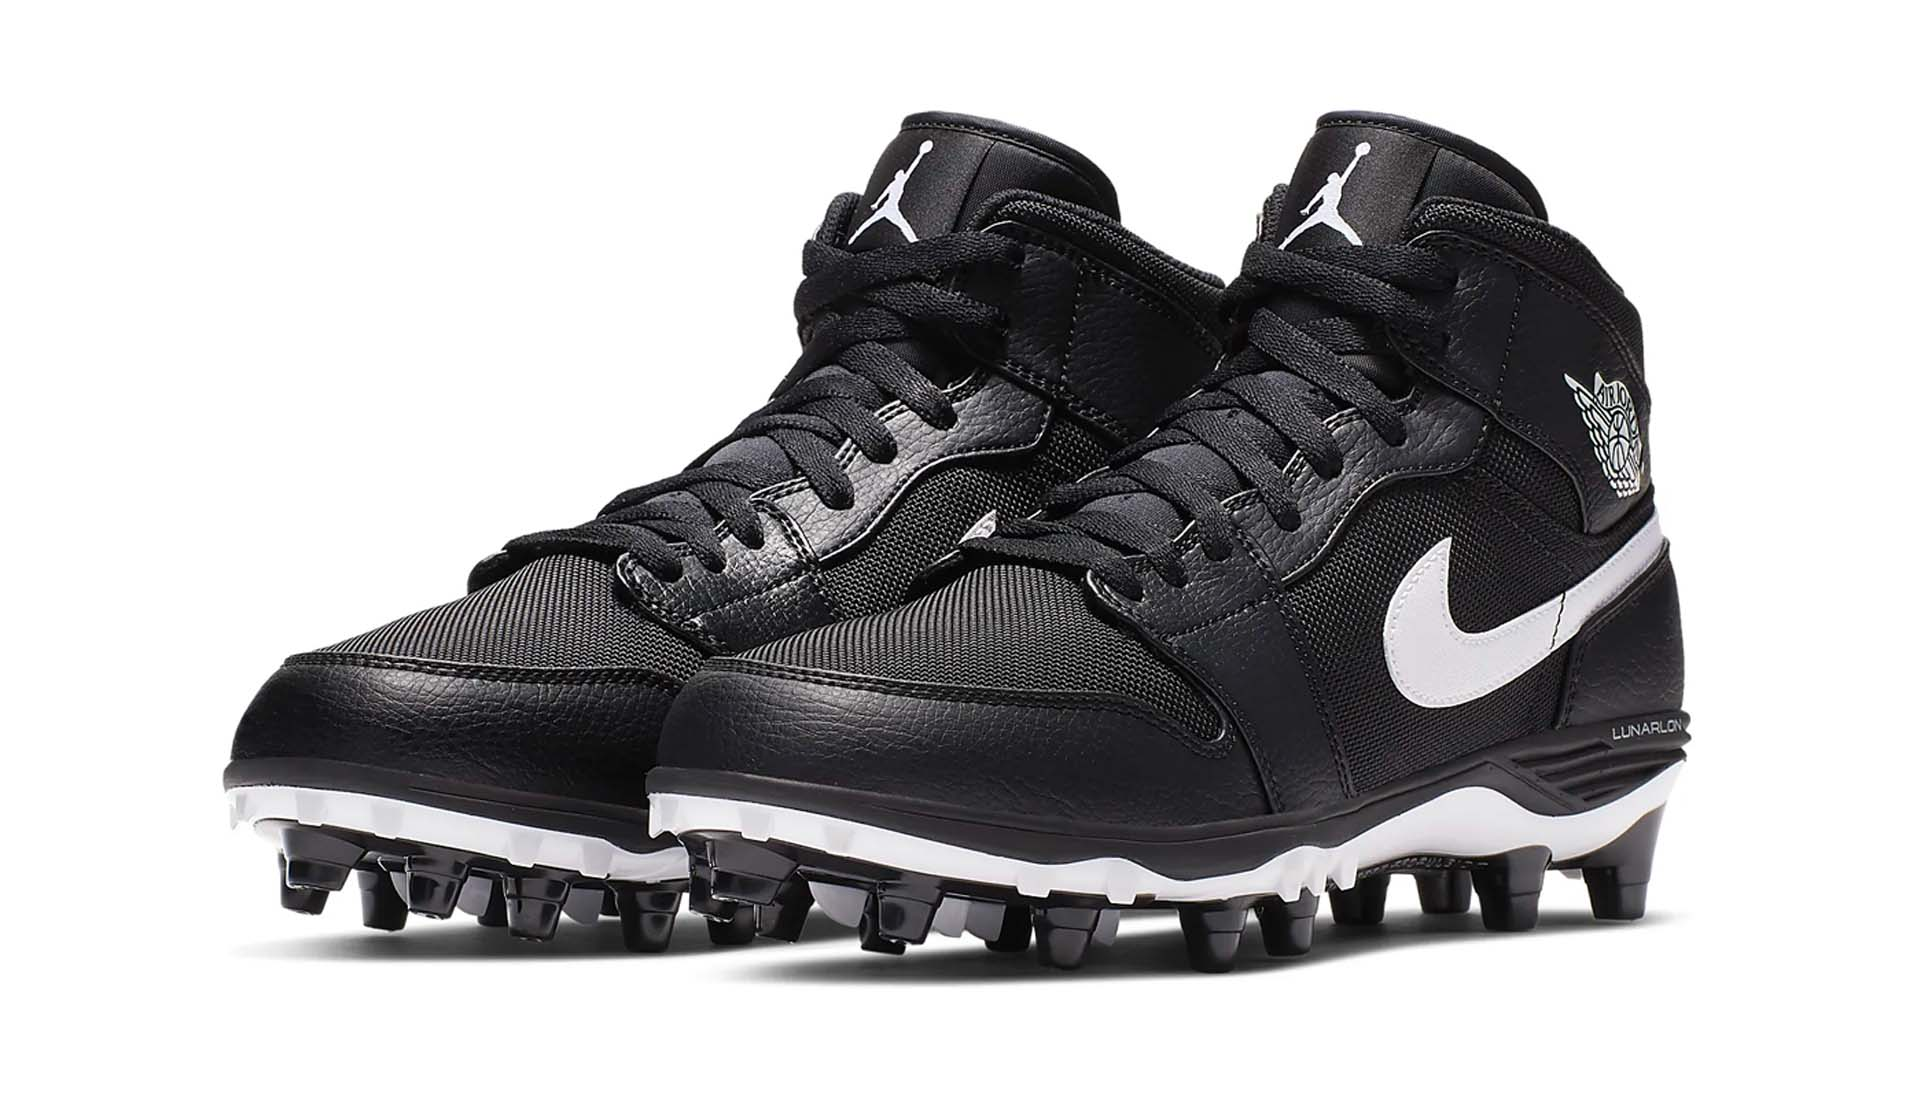 9603b4c5c7c6 Nike Recreate The Air Jordan 1 Into Football Cleat - SoccerBible